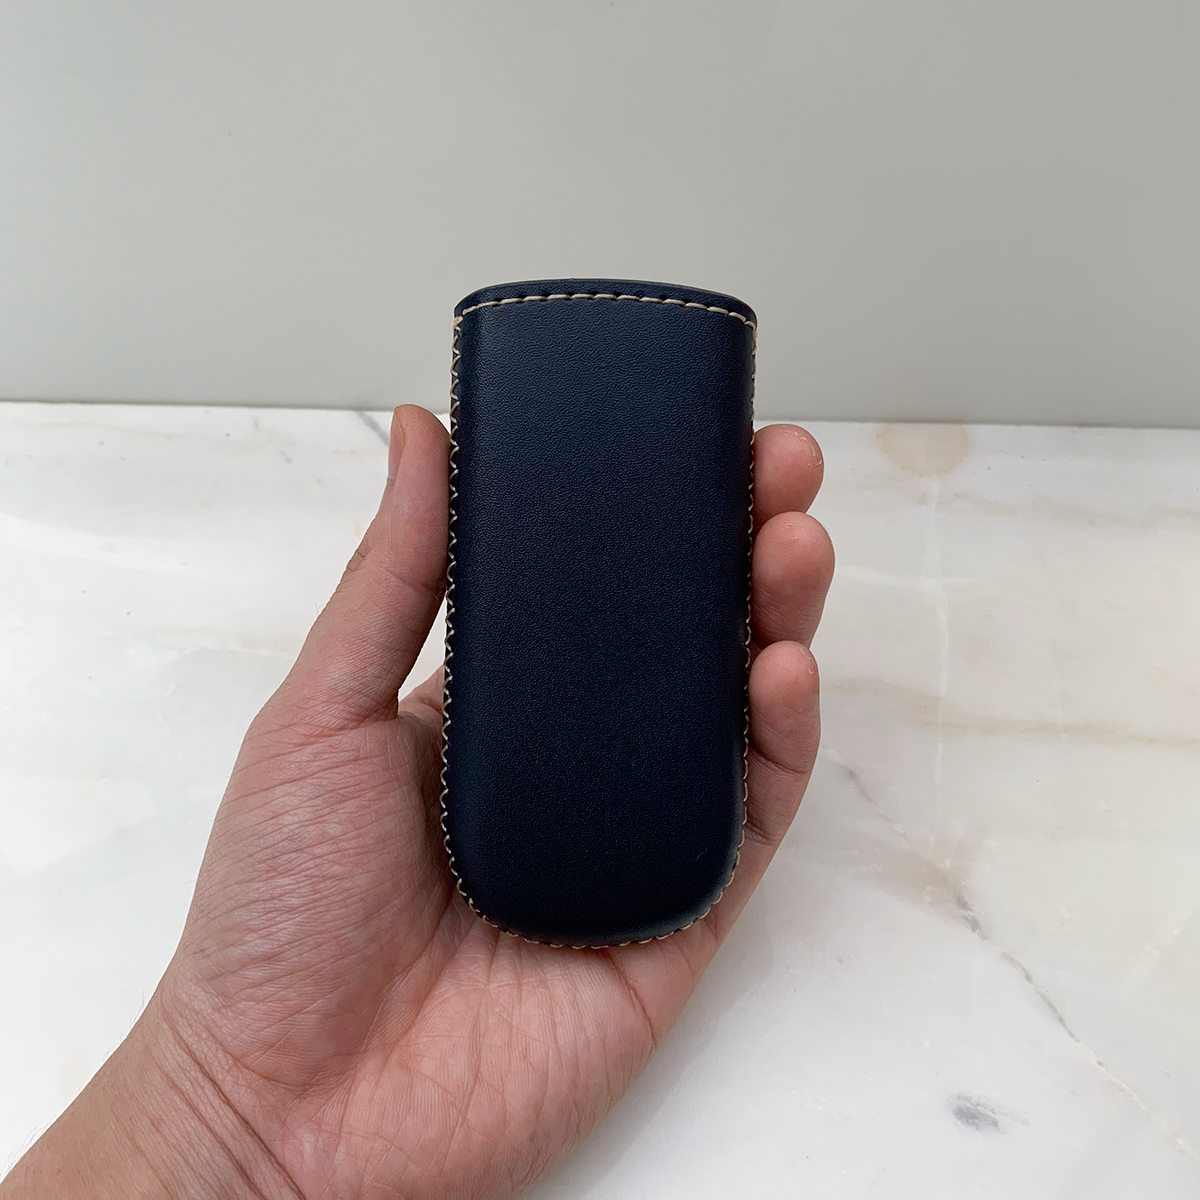 Bao da 8800 Handmade - Bao điện thoại Nokia 8800 da thật - Miễn phí khắc hình